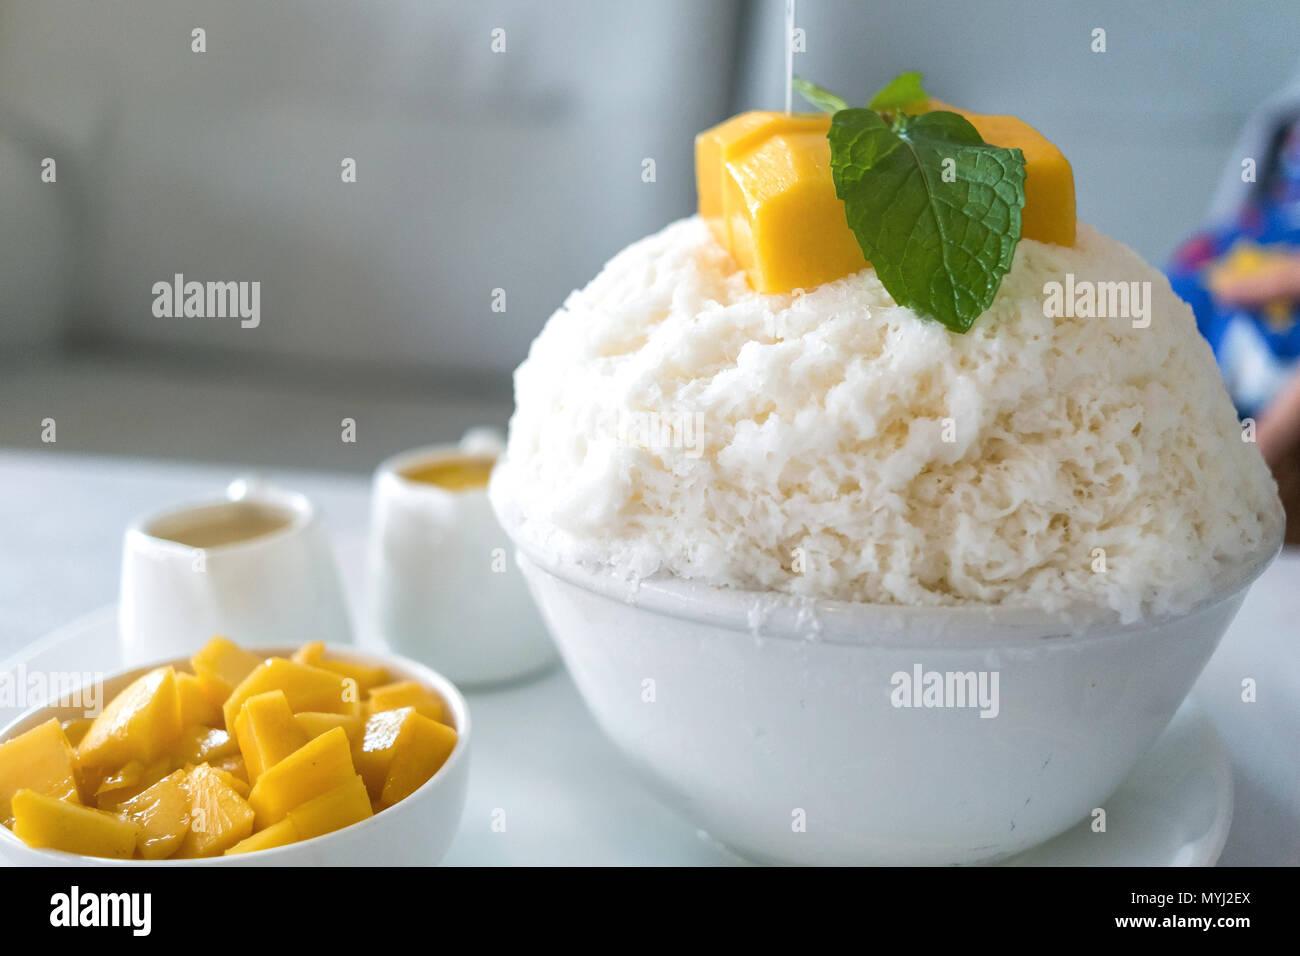 Bingsu Mango Korean Desserts Shaved Ice Desserts With Mango On Top